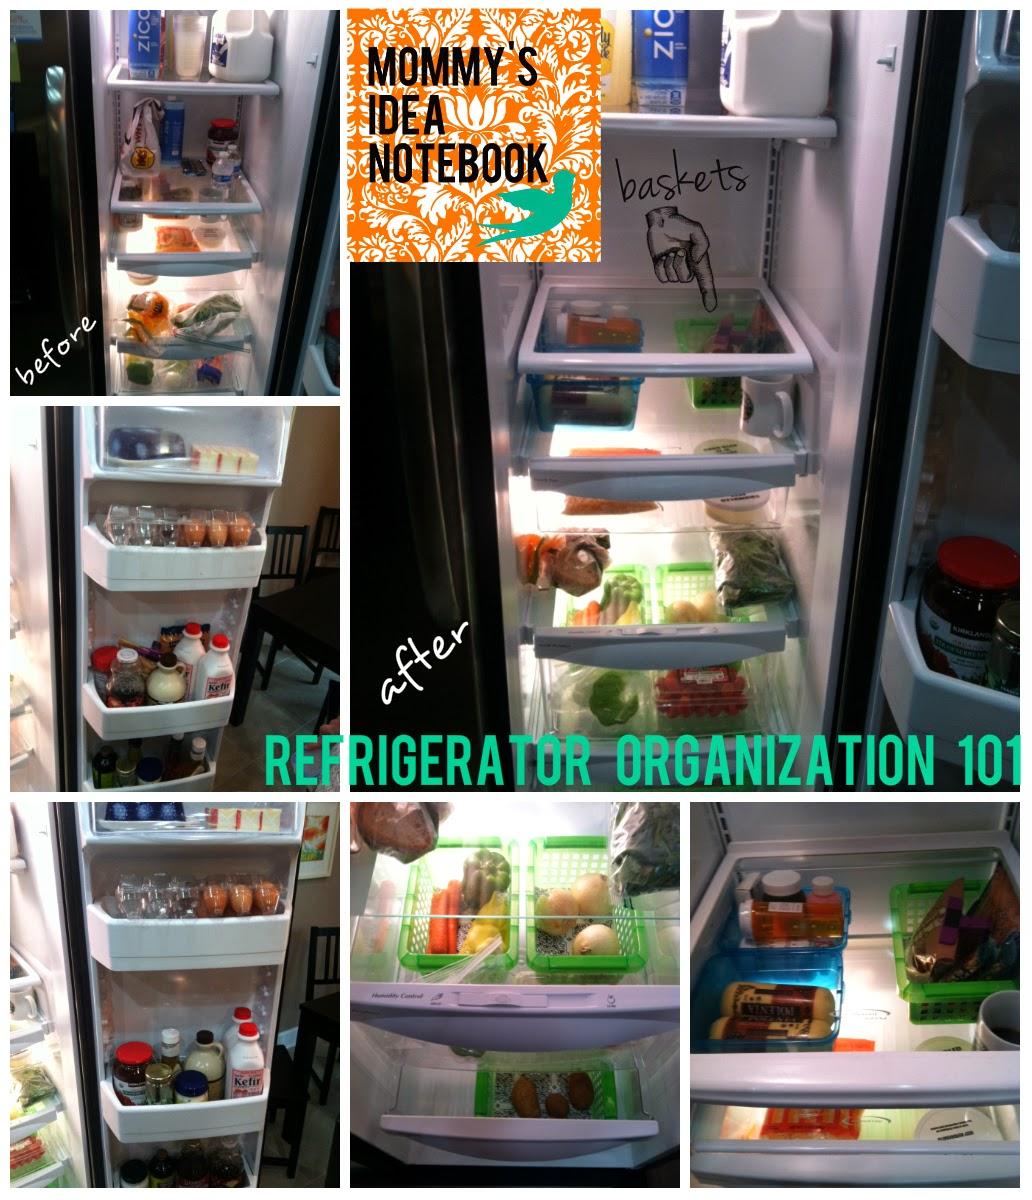 Kitchen Appliance Shop Dunham Design Company Home Organization 101